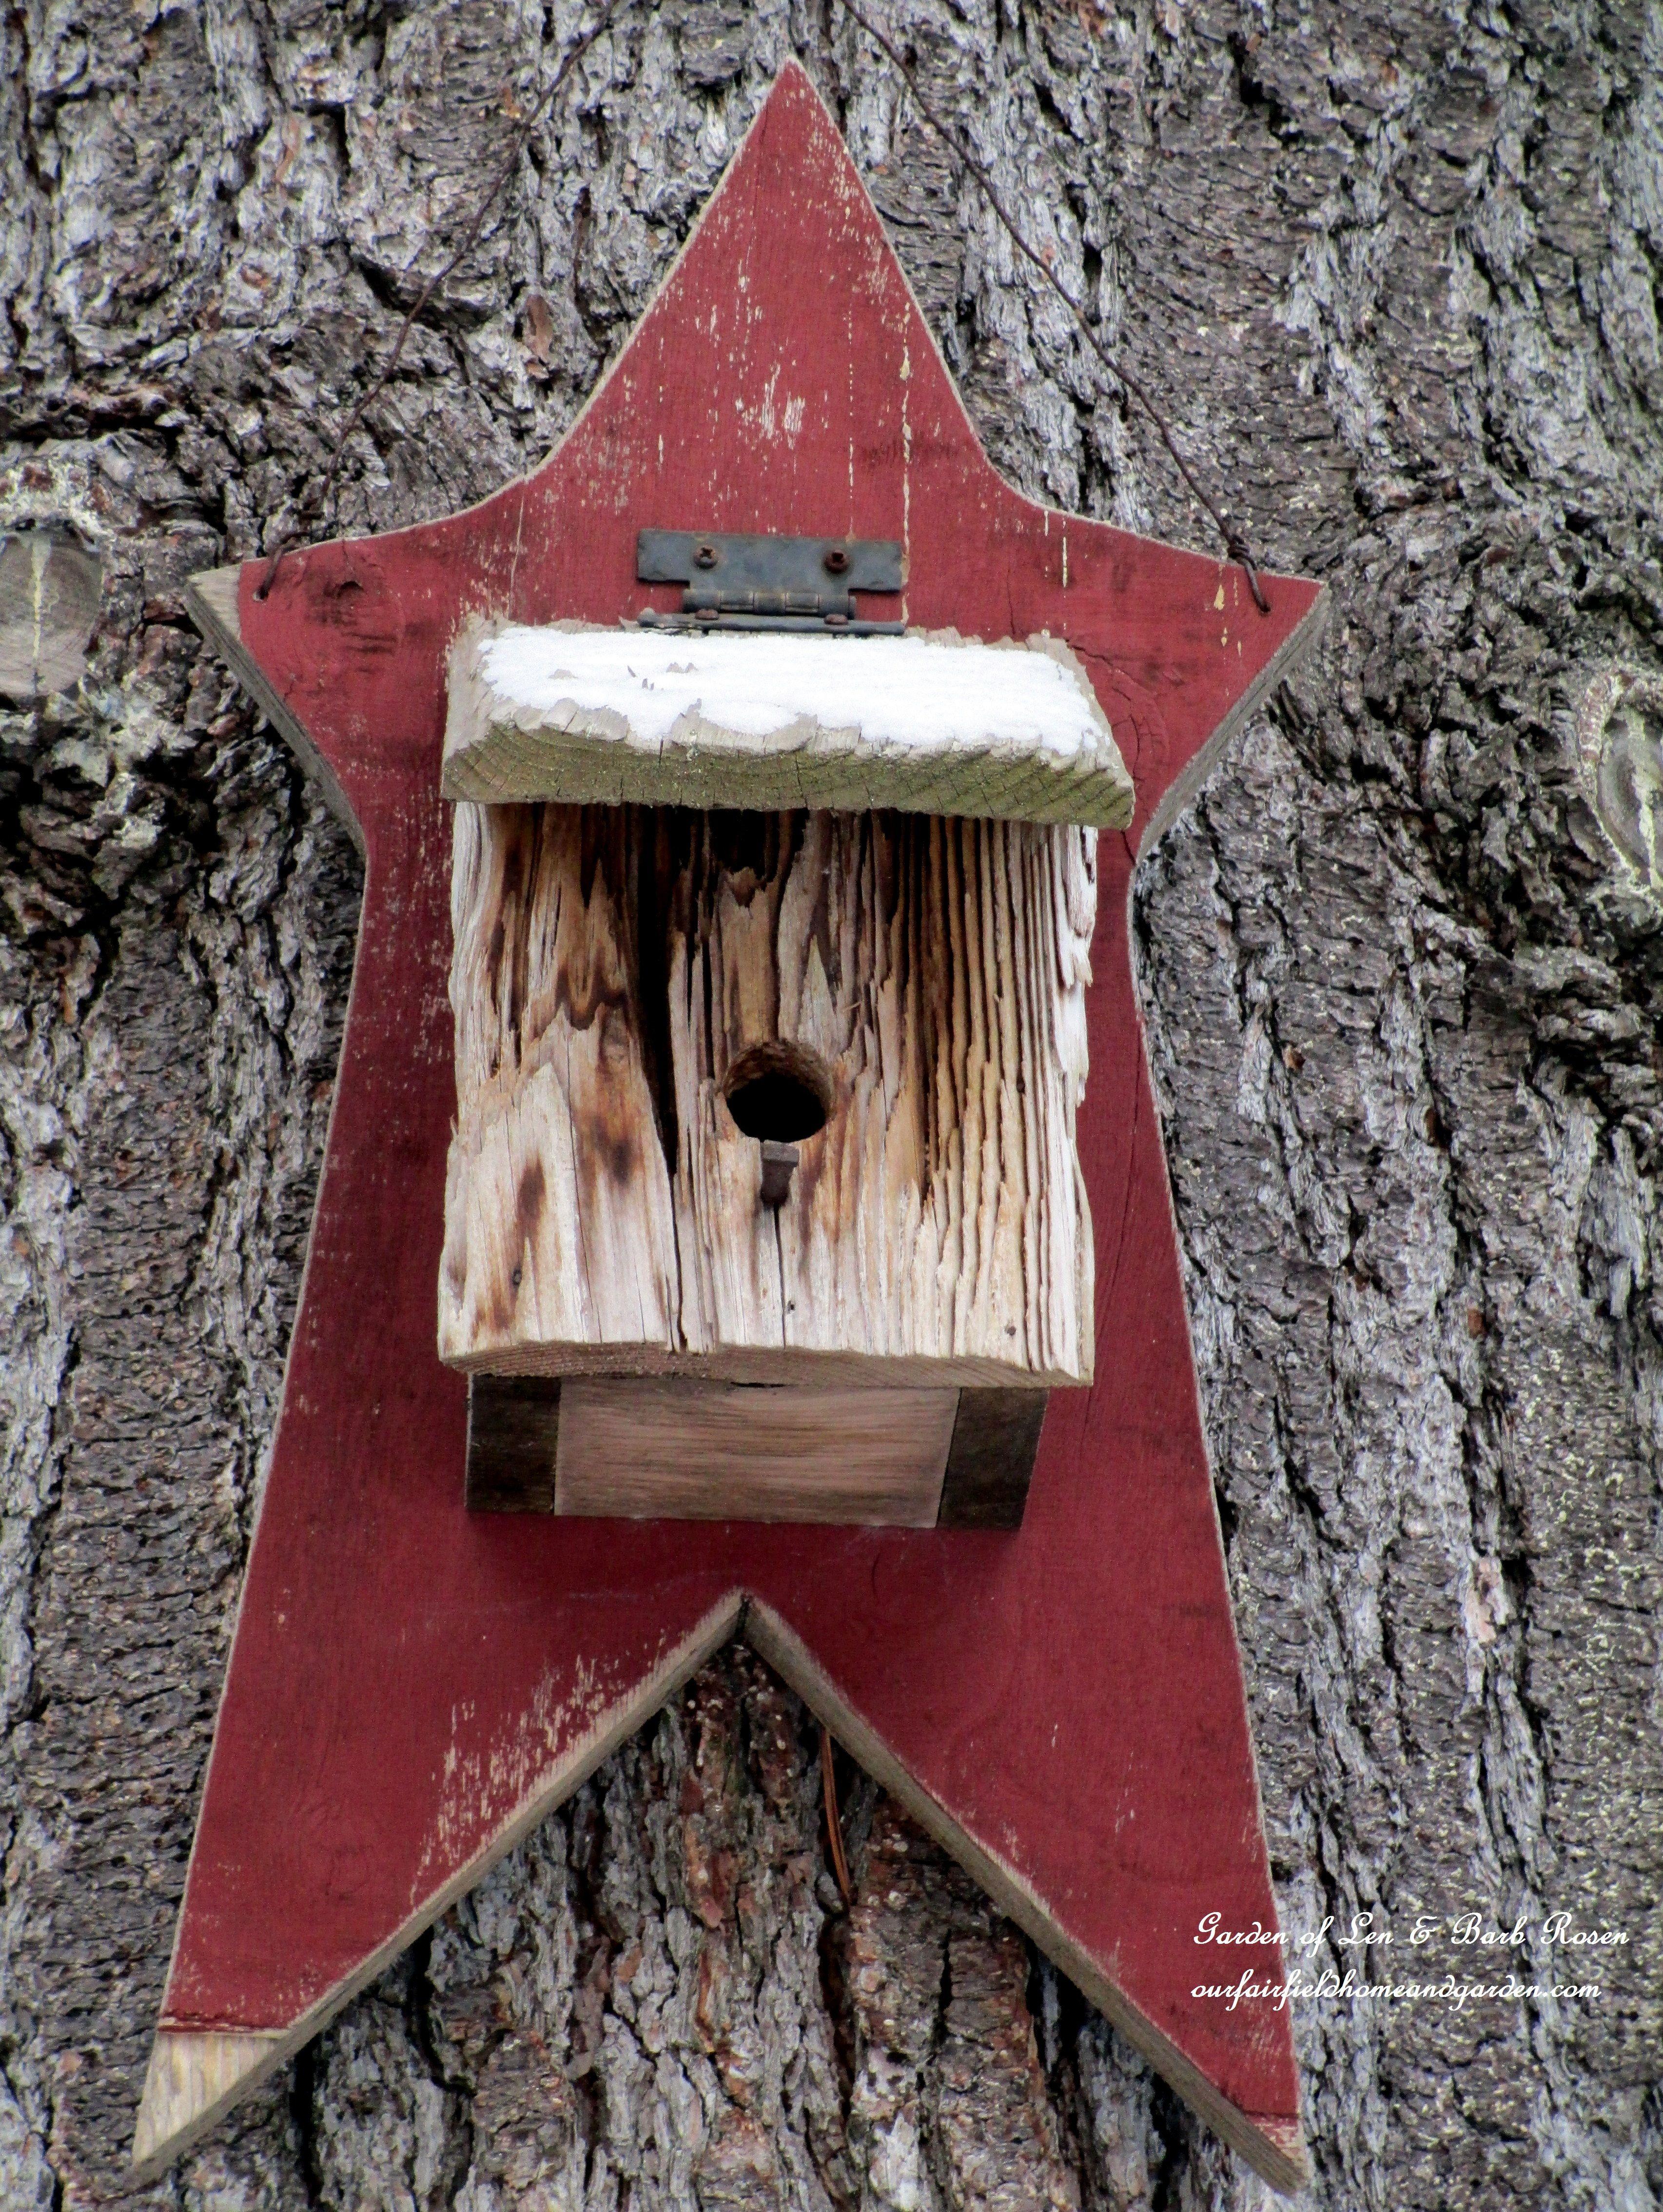 Rustikale Len rustic birdhouse garden of len barb bird houses